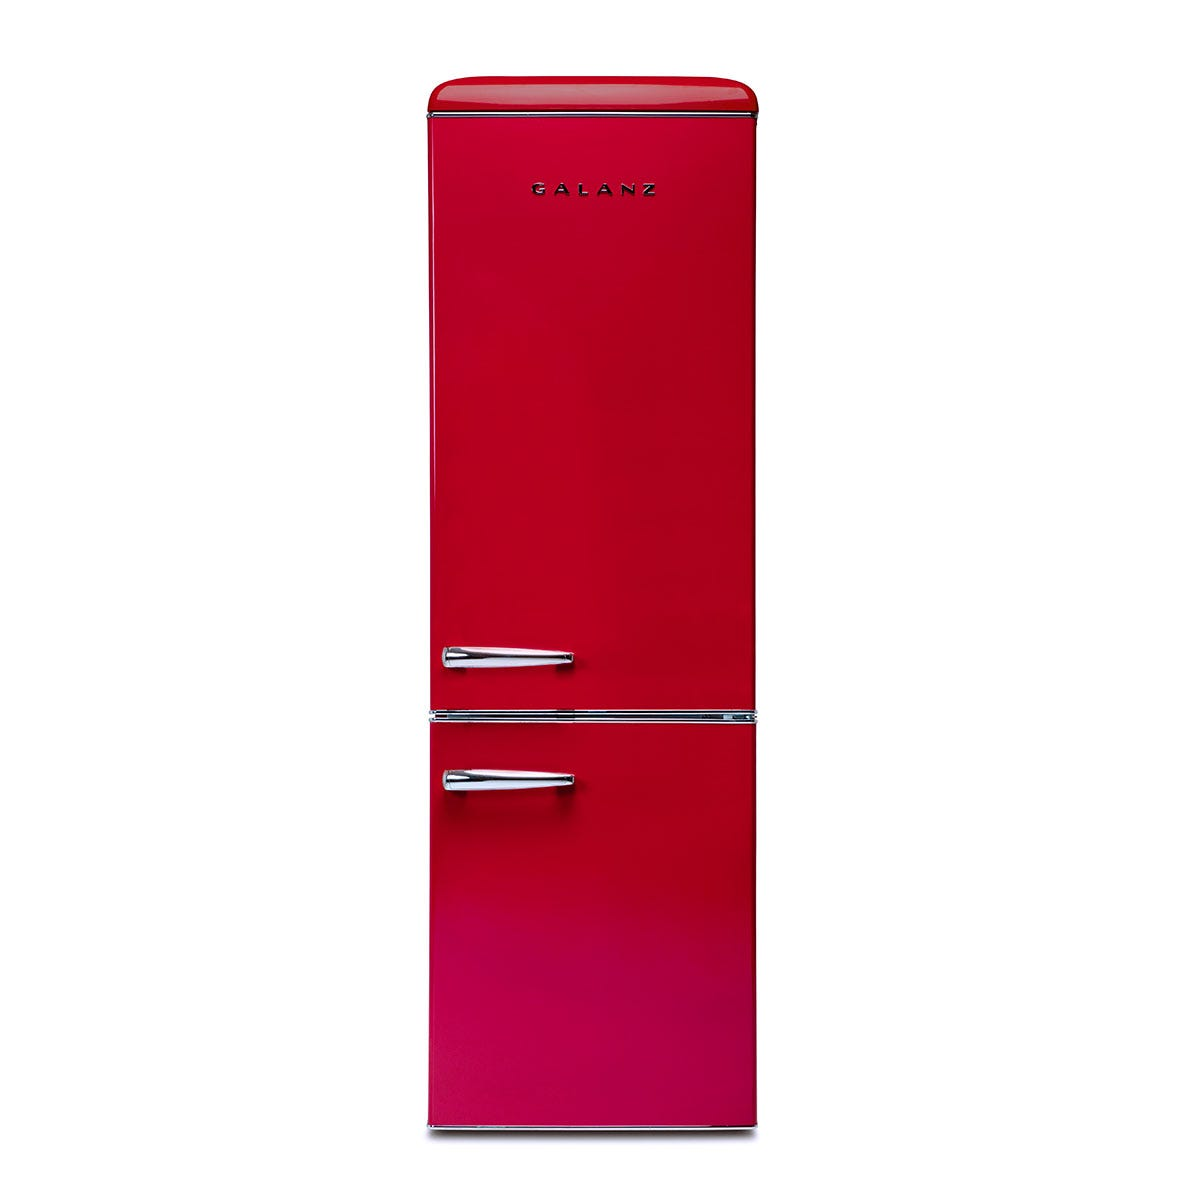 Galanz RFFK002R 300L Freestanding Retro Fridge Freezer - Red